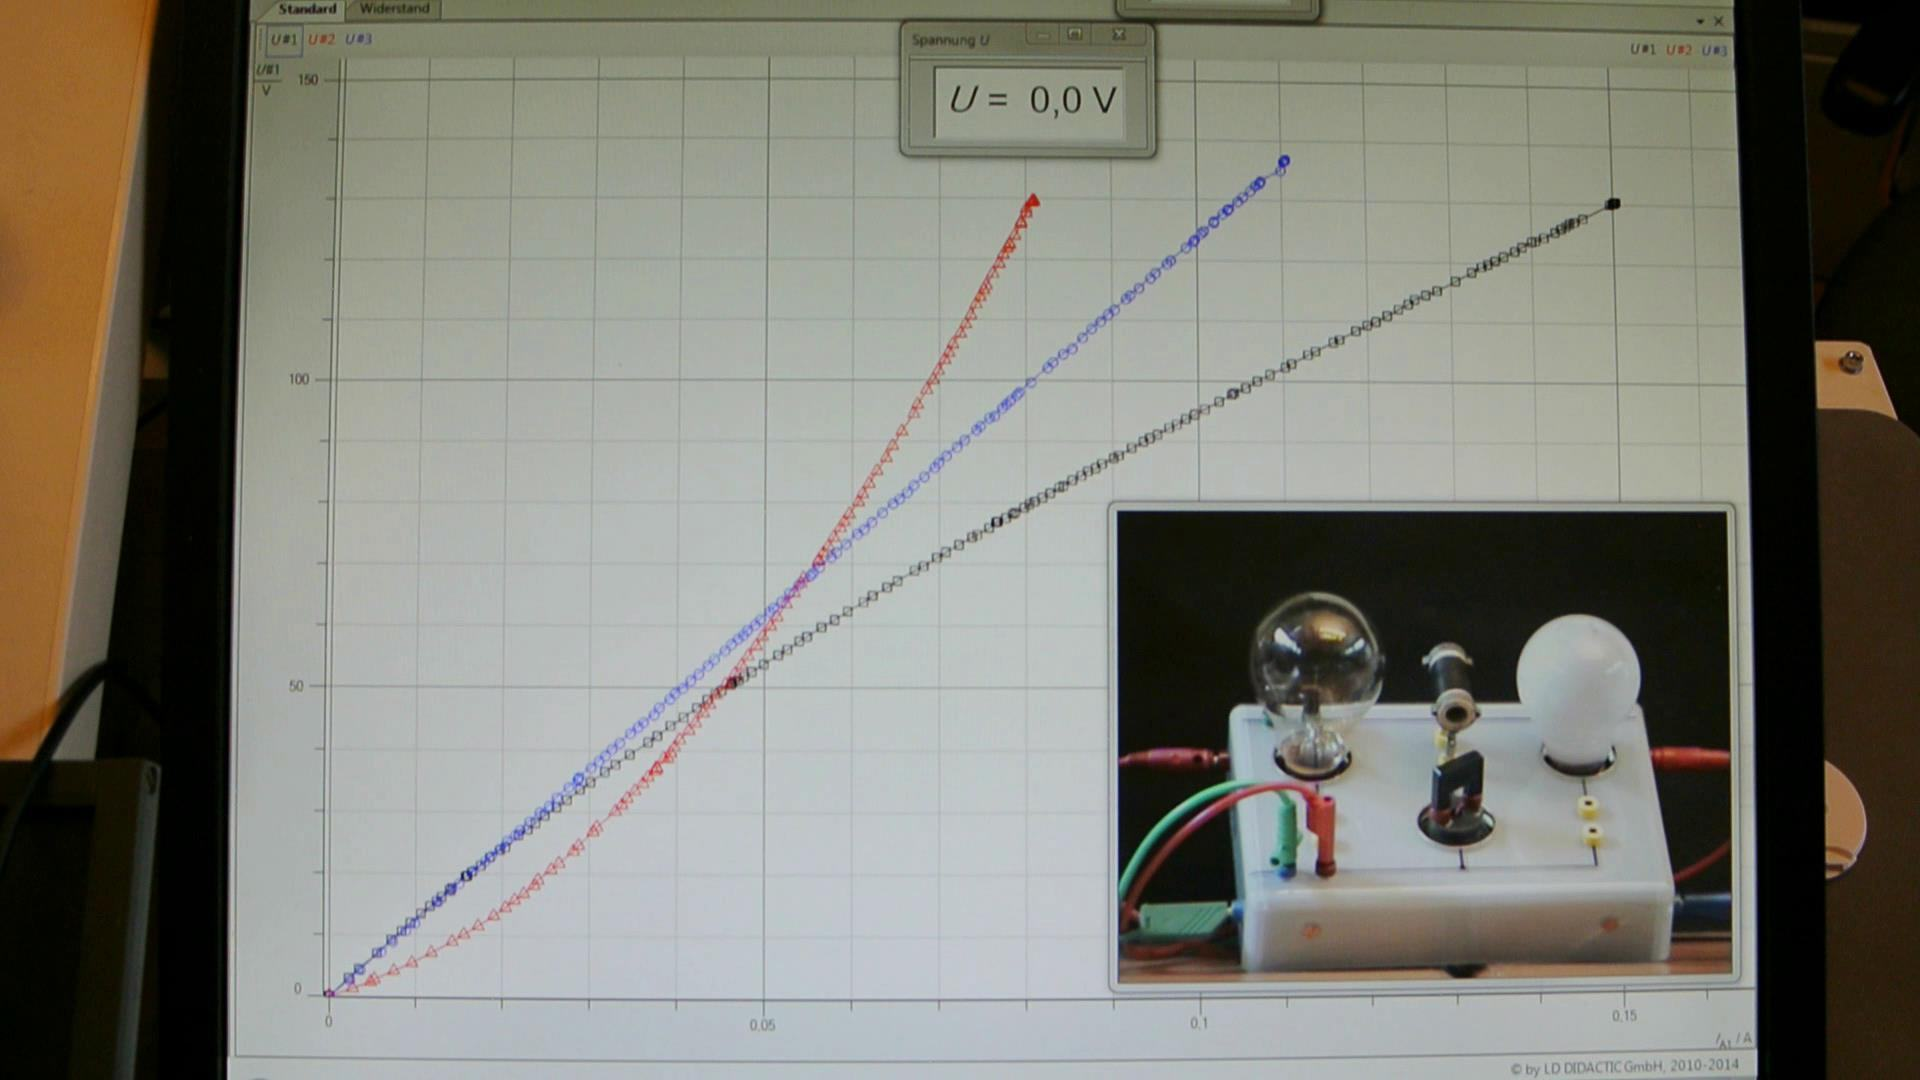 Strom-Spannungscharakteristik (Glühlampe, Kohlefaden, Konstantan ...